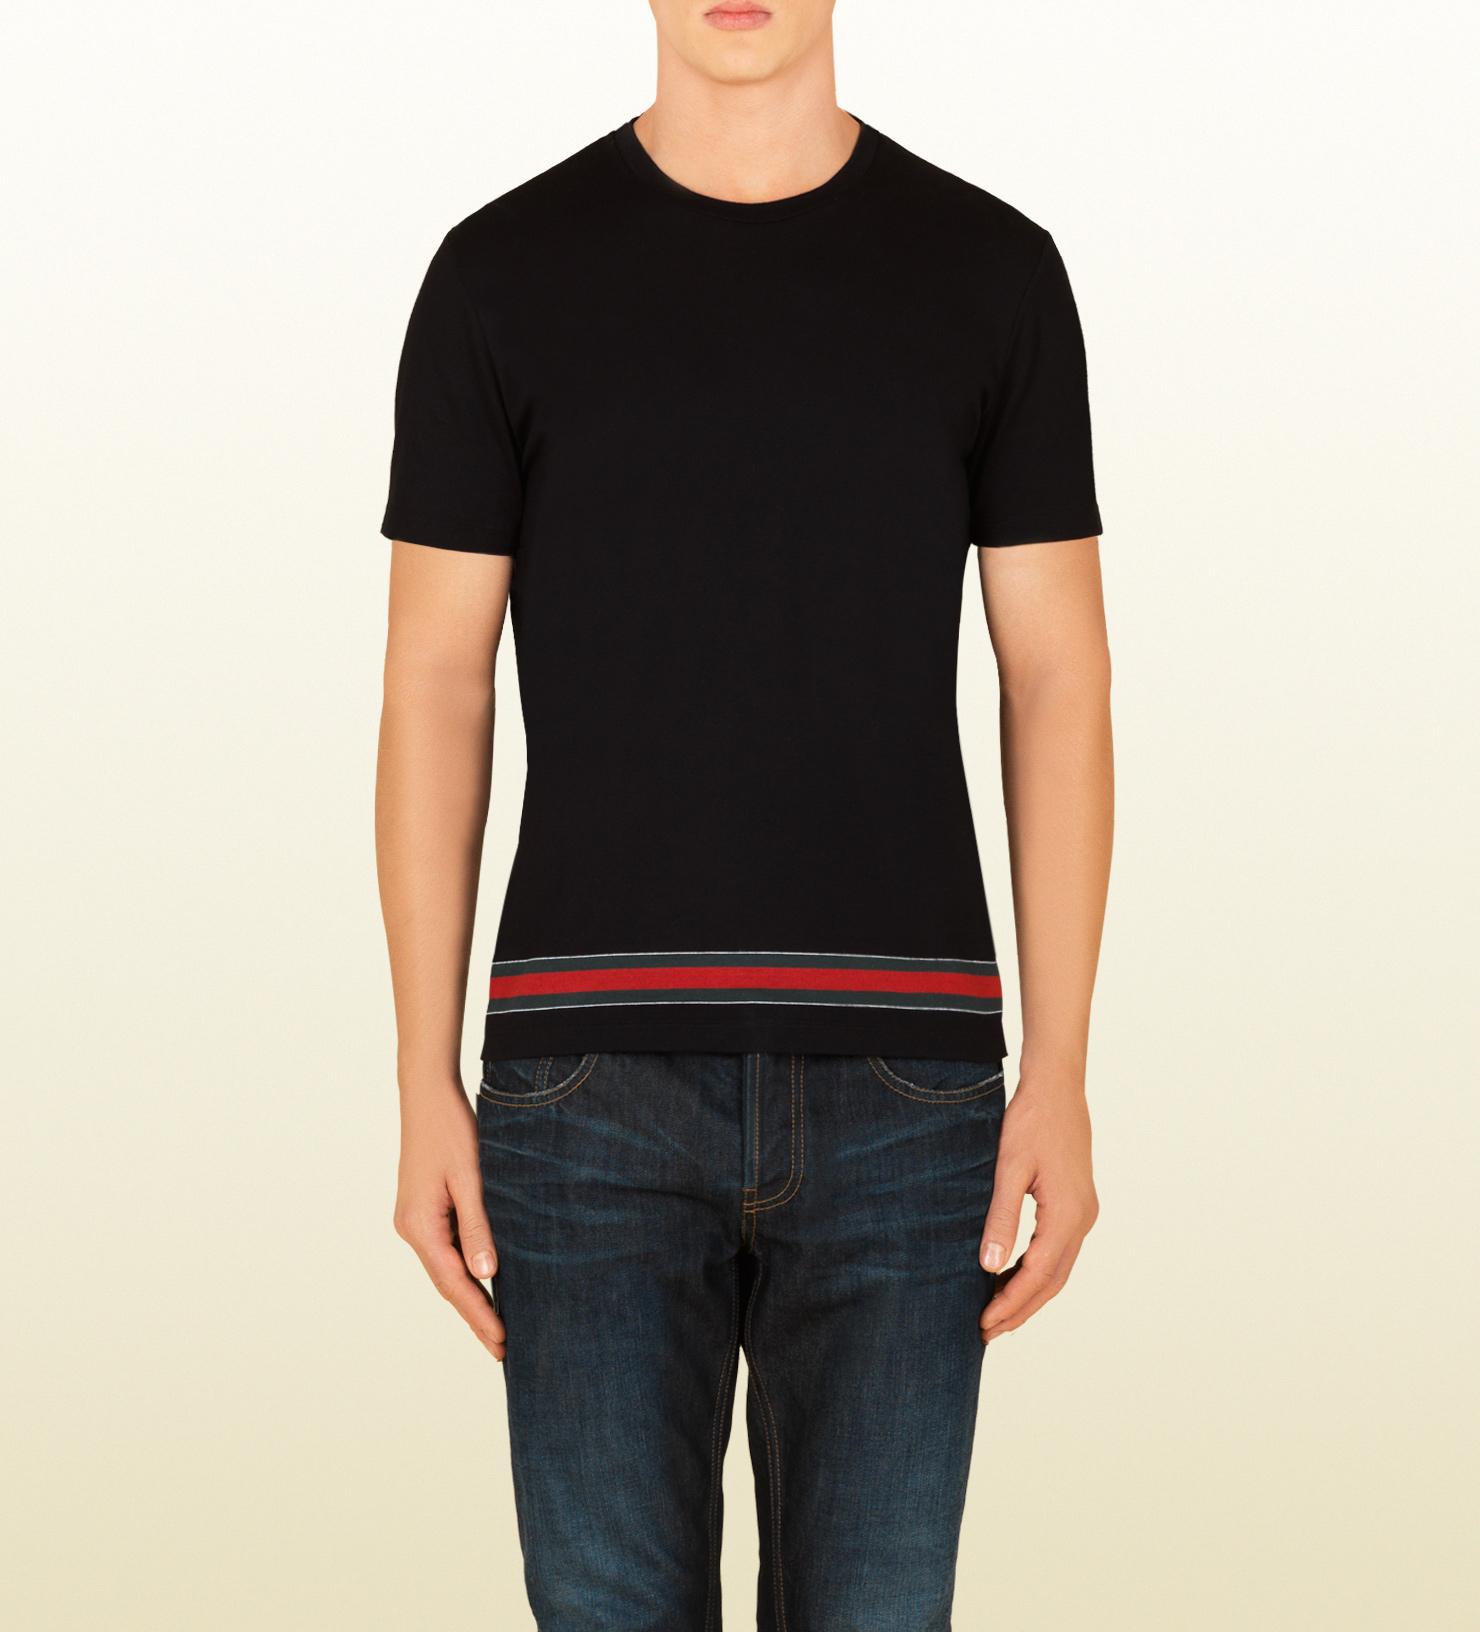 Gucci Shirt For Roblox « Alzheimer's Network of Oregon